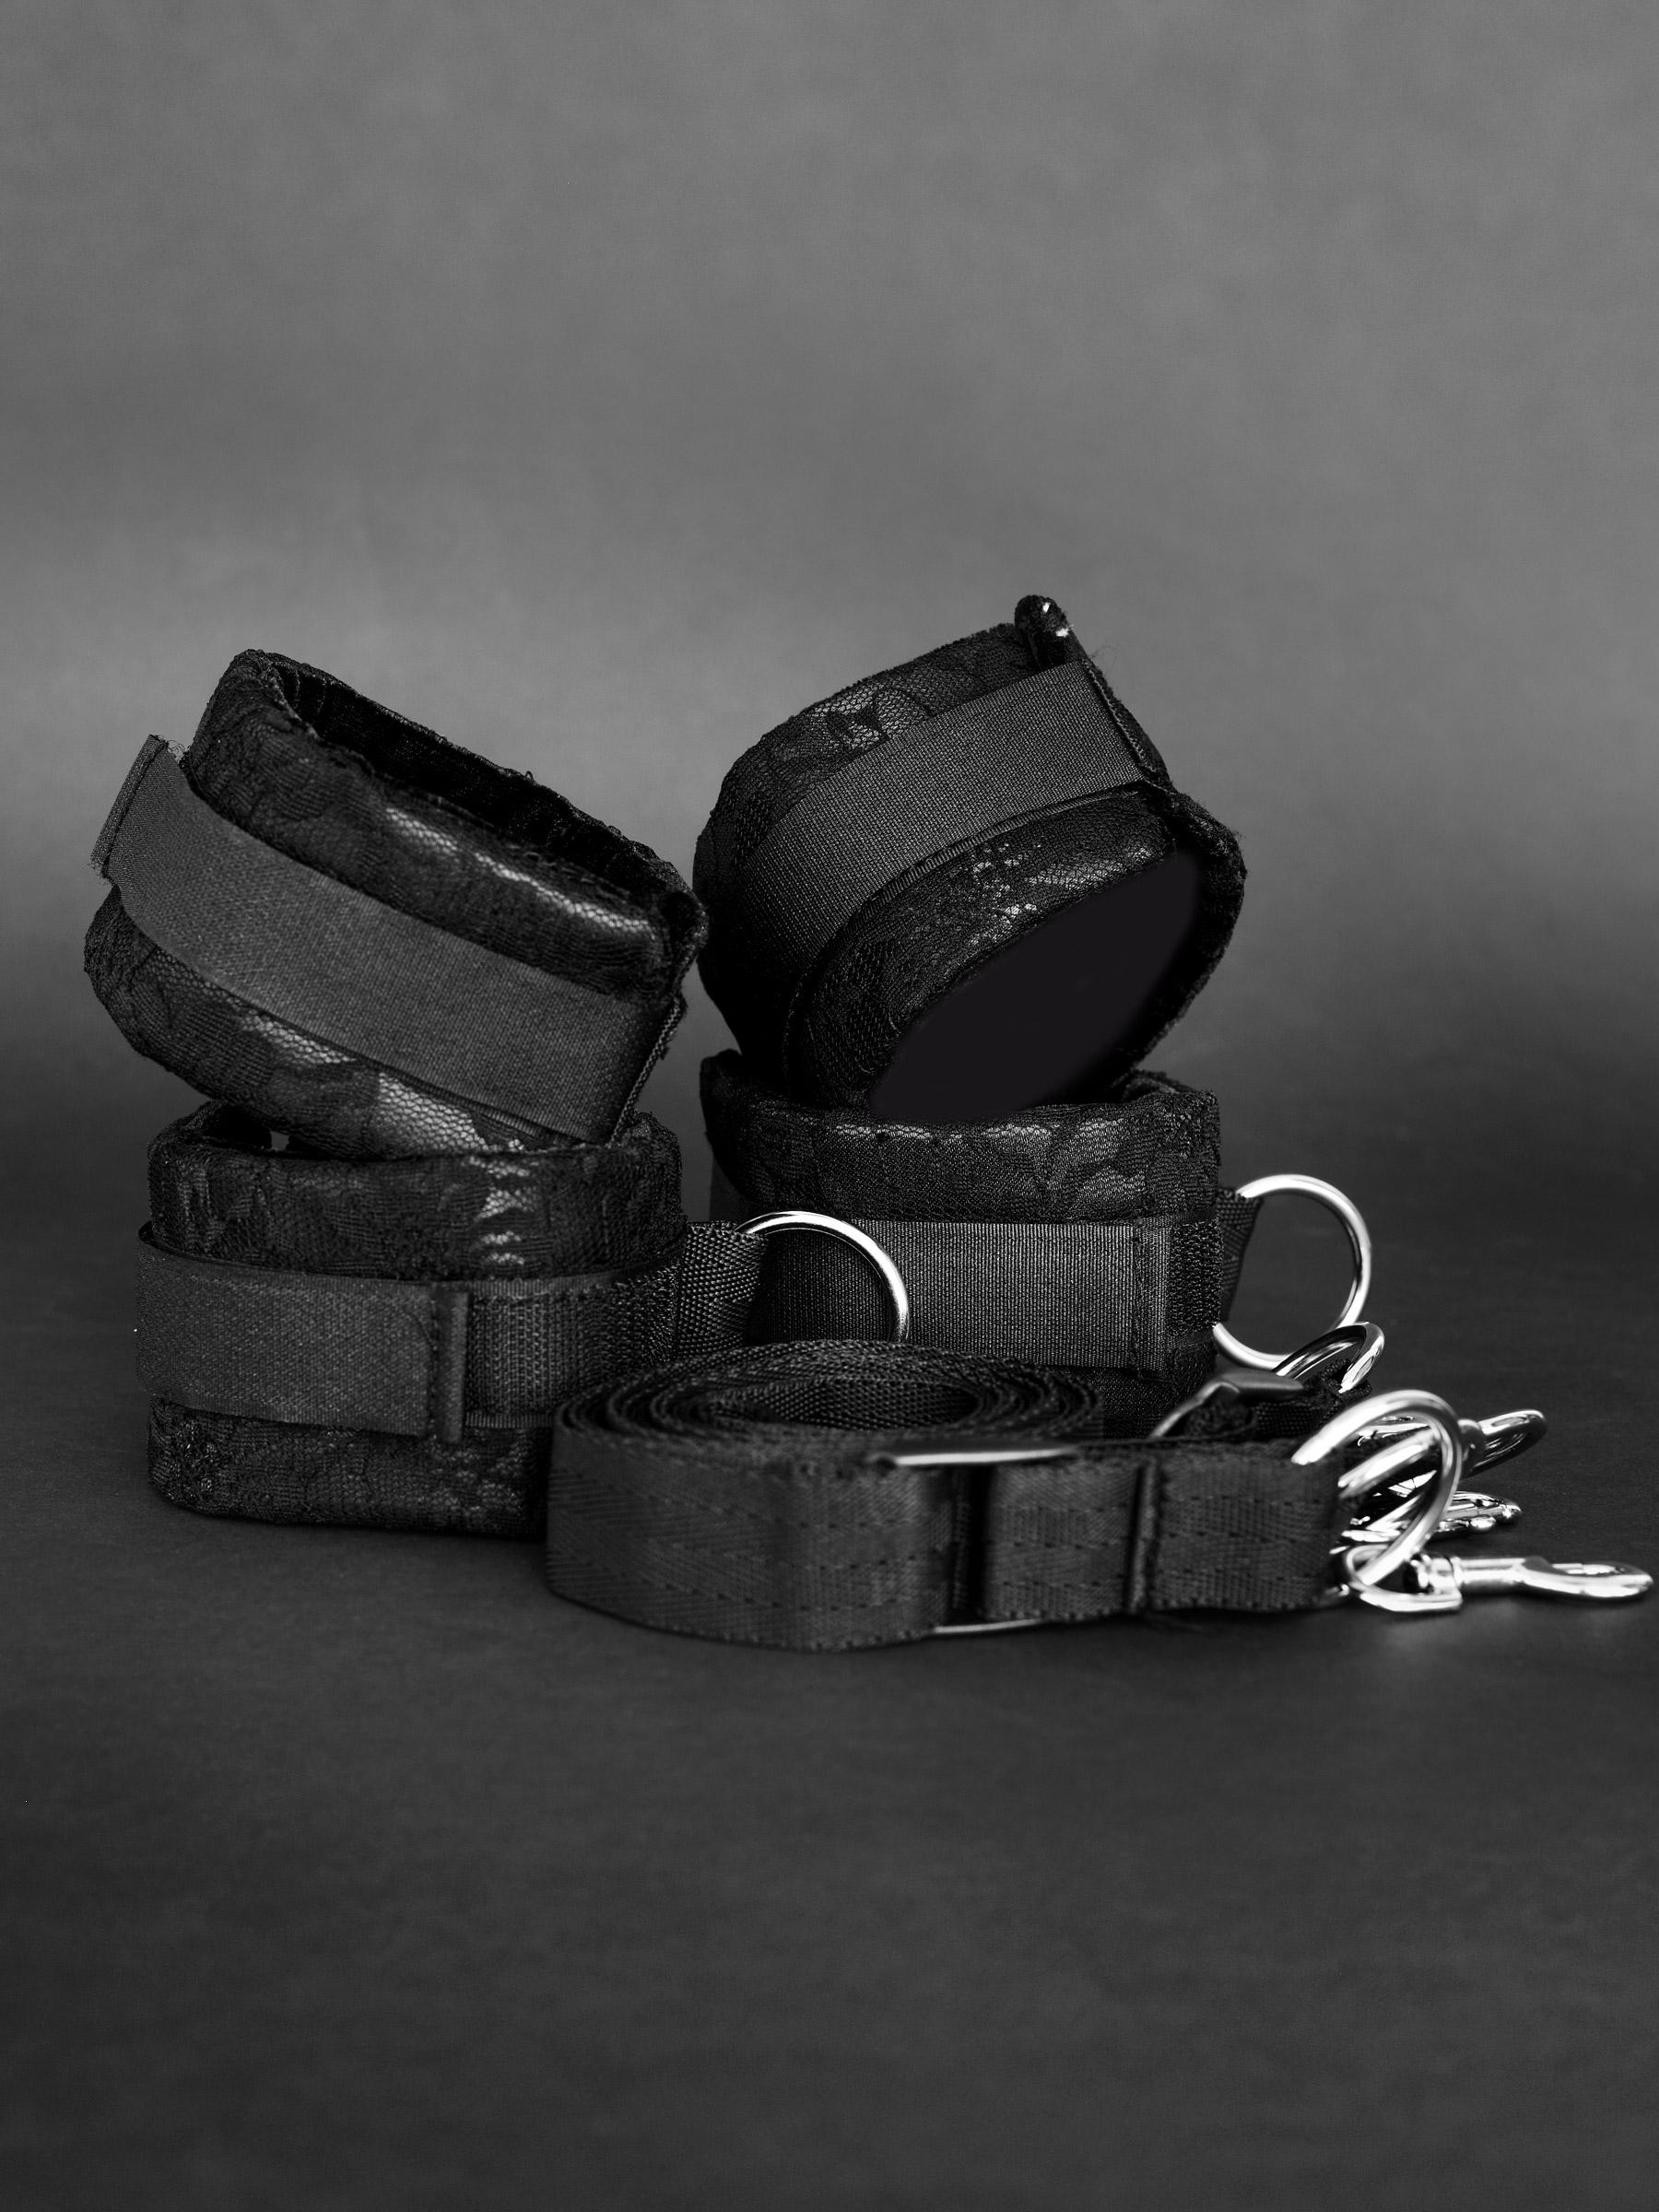 dejtingsida gratis bondage kit